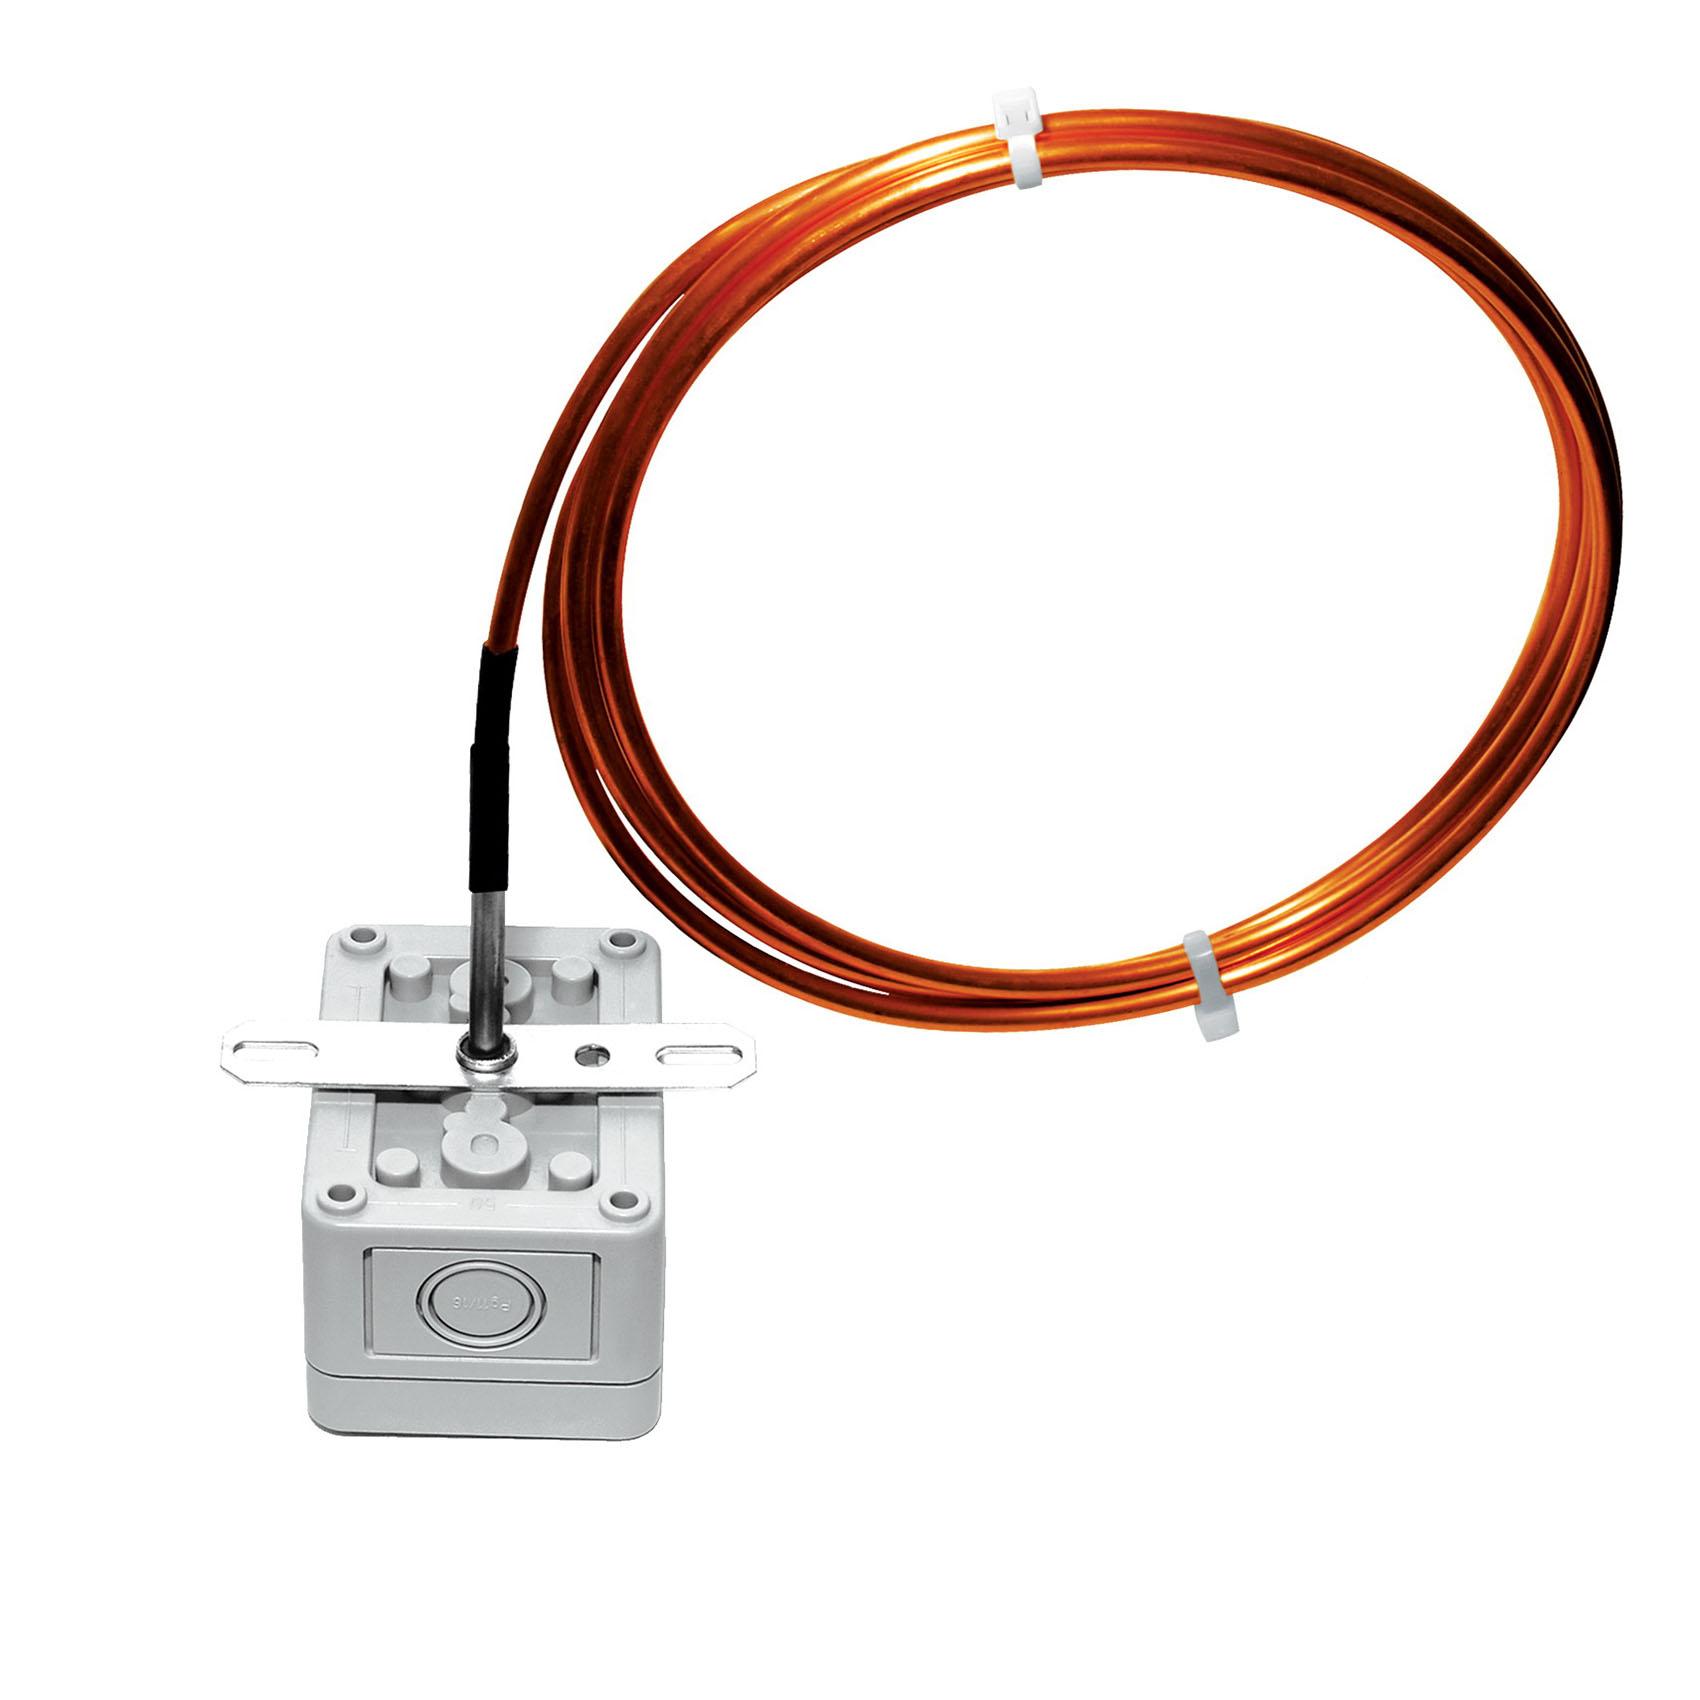 ACI A/20K Series A/20K-A-8'-4X Averaging Sensor